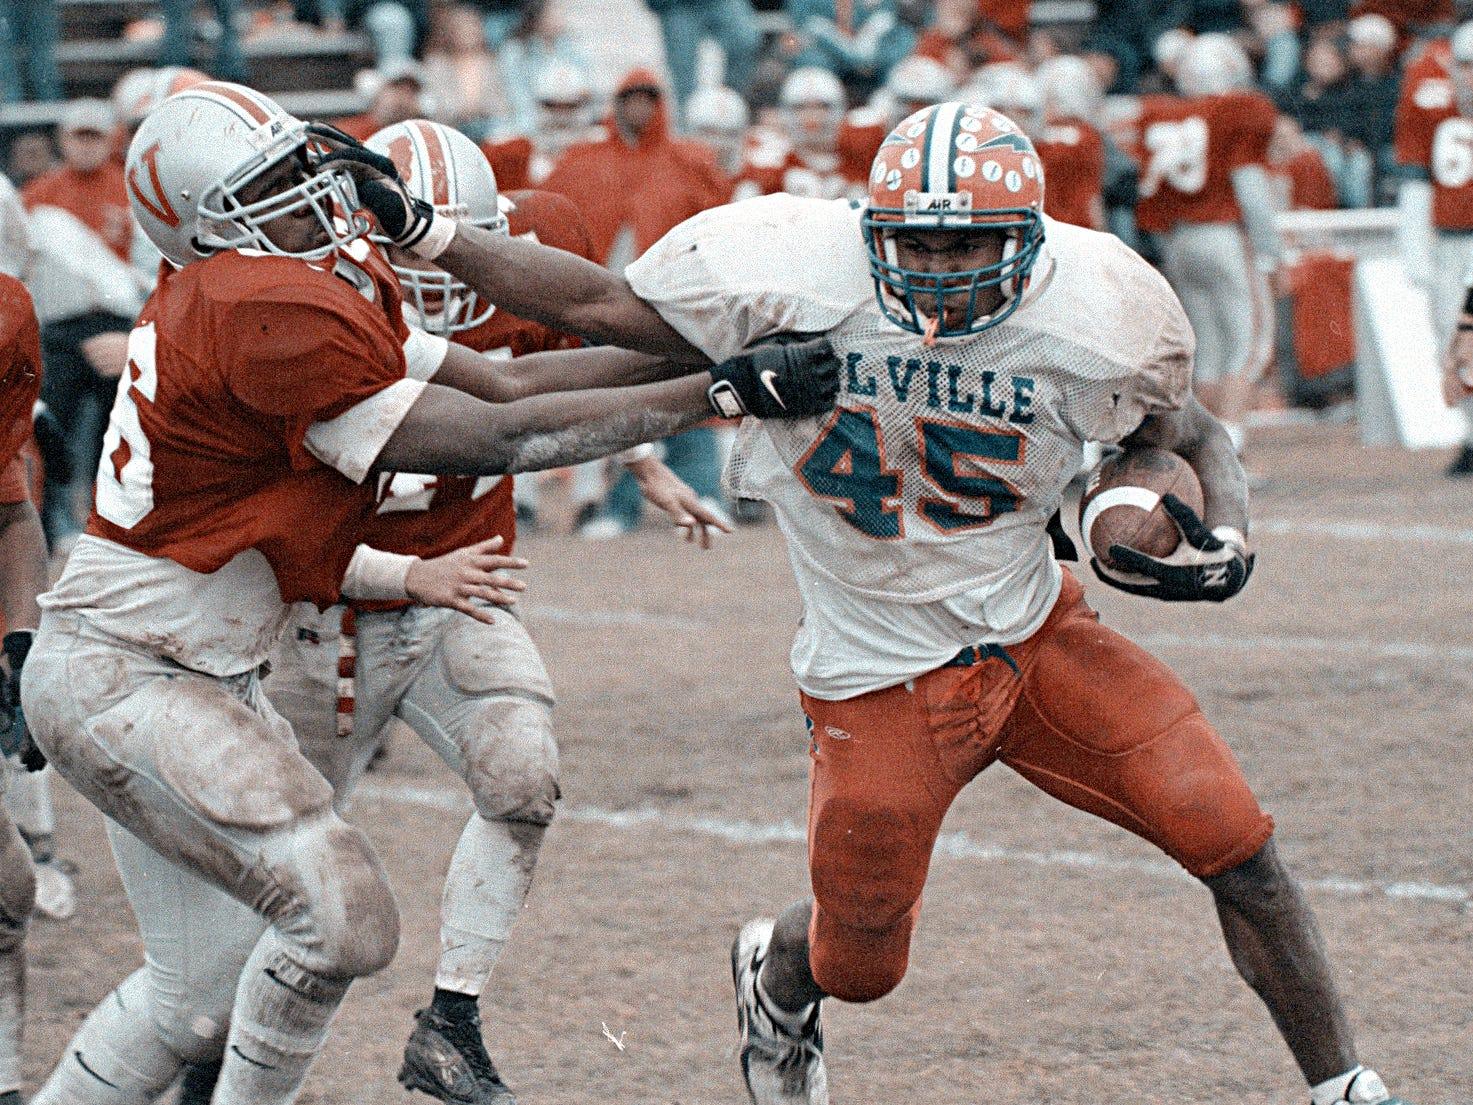 Football: Vineland vs. Millville in 1998